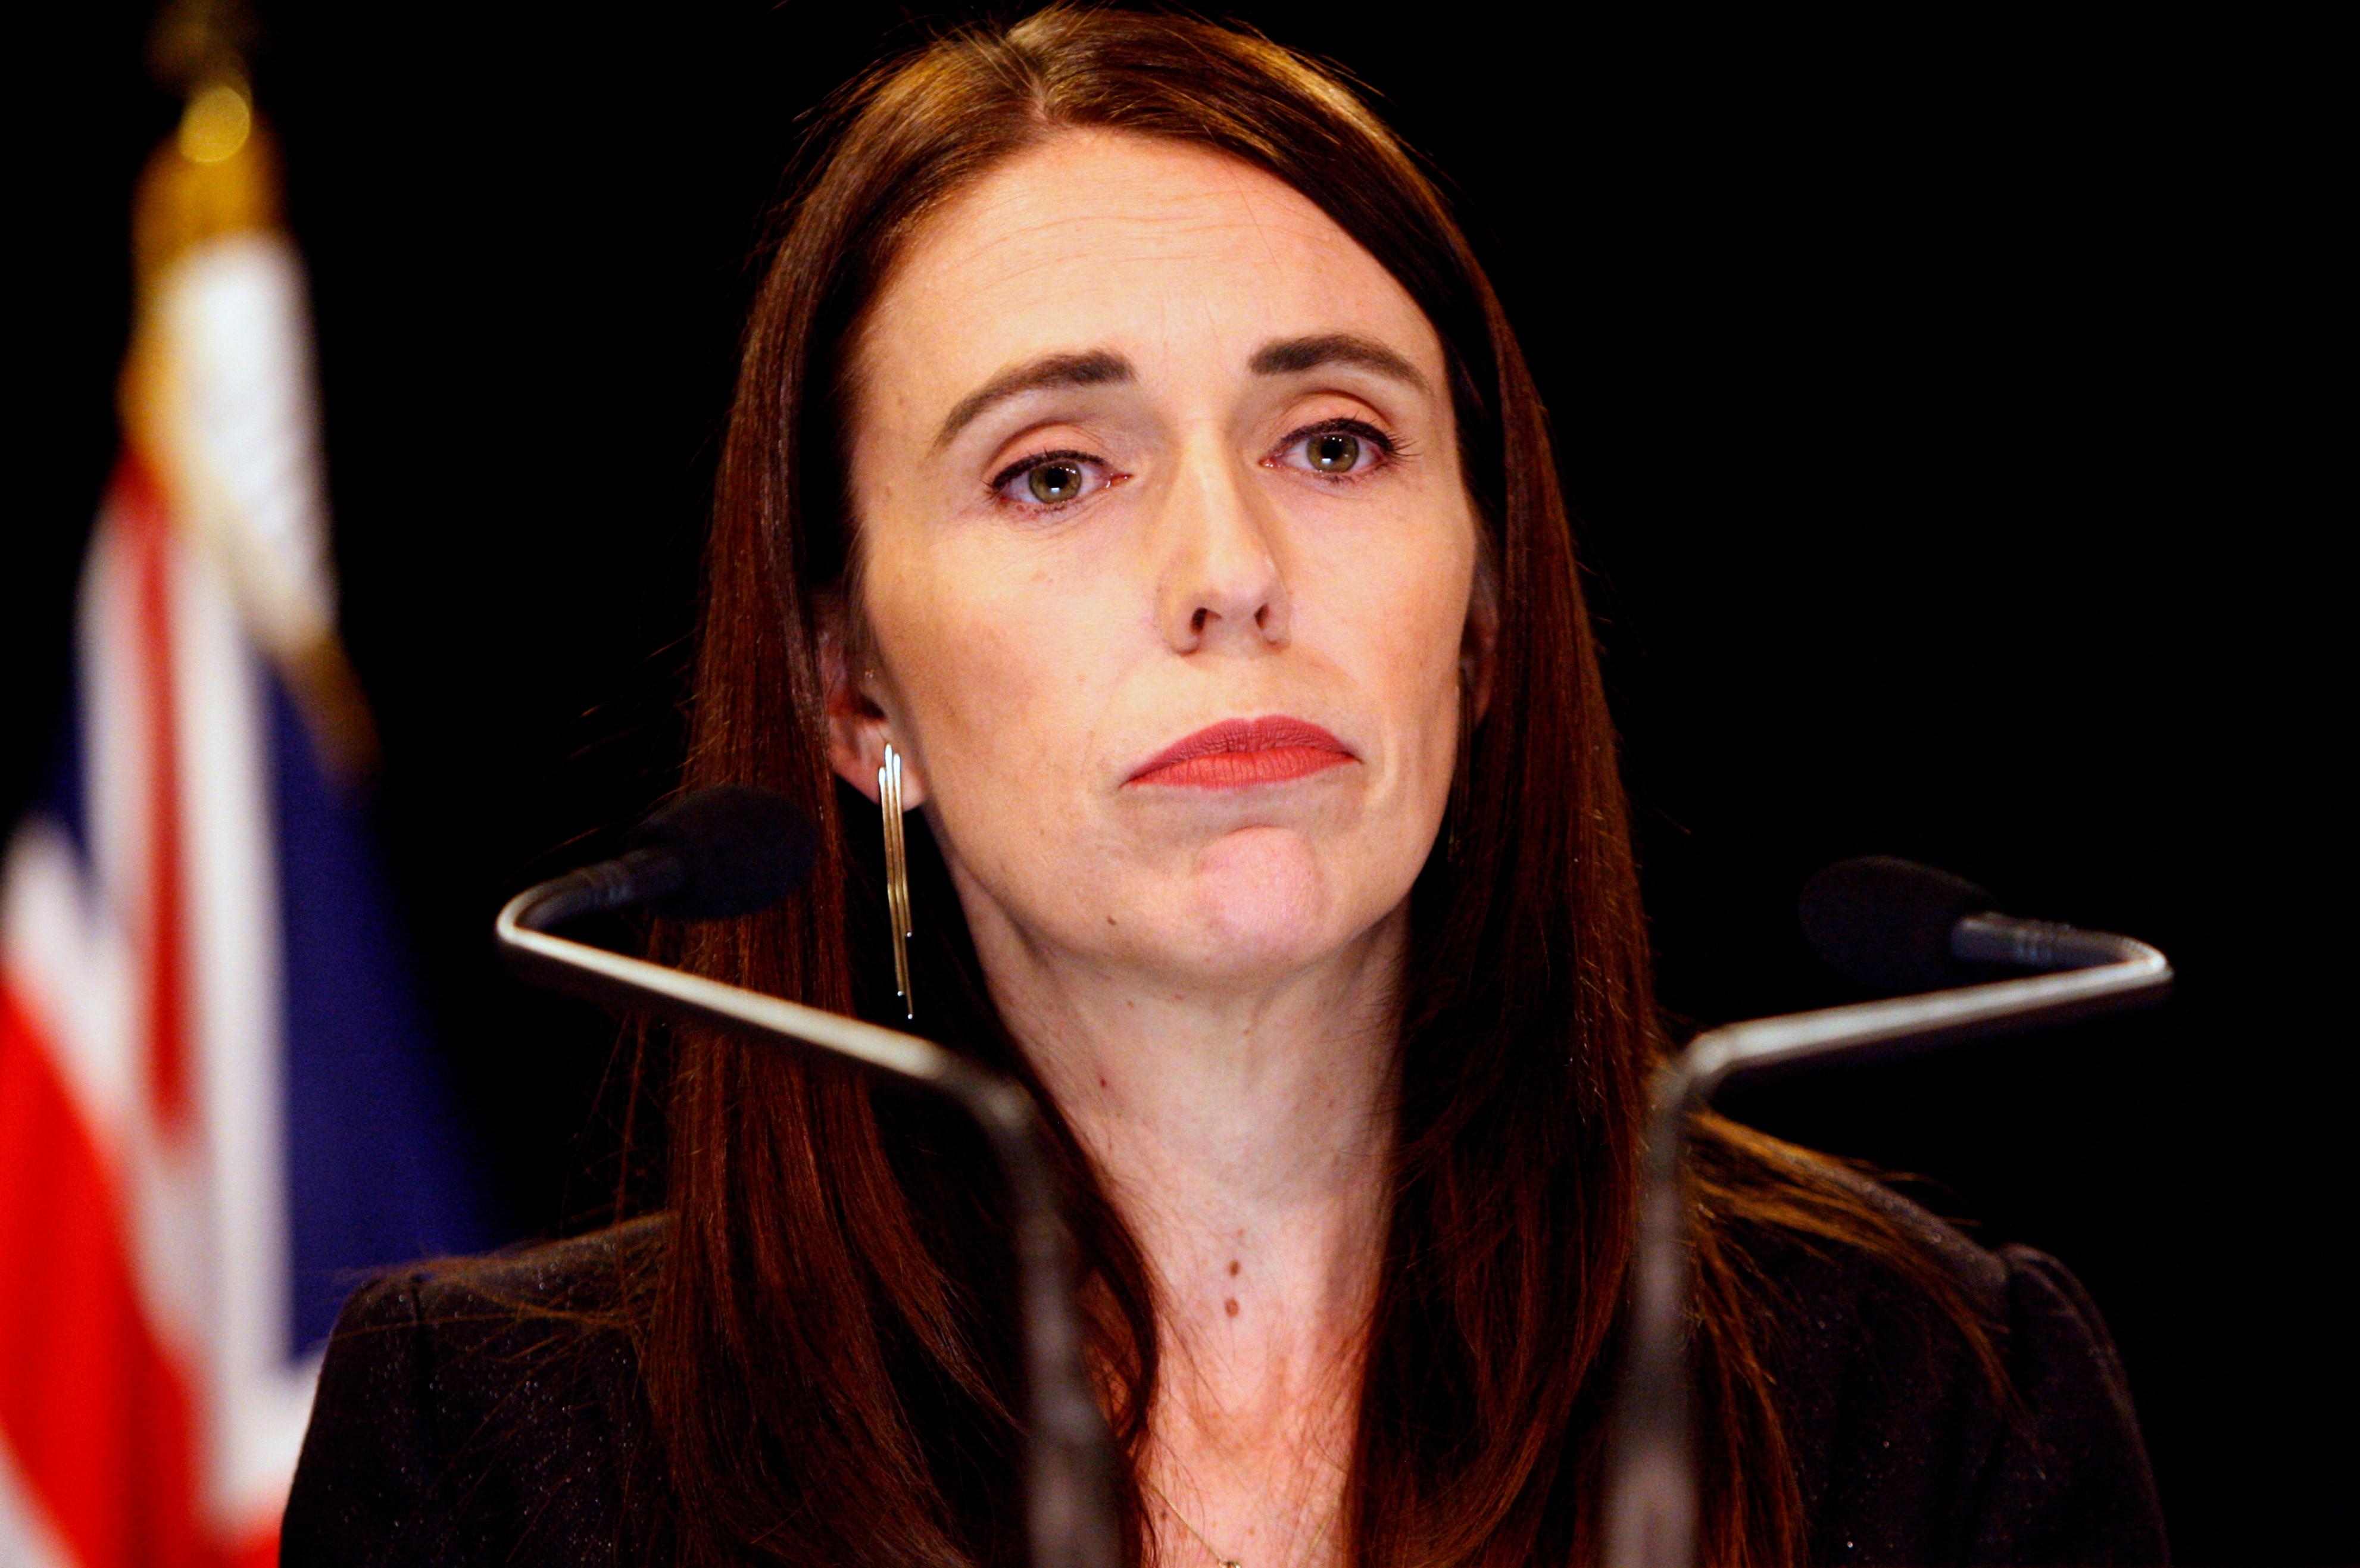 Alan Jones' tirade against Jacinda Ardern was more than just words